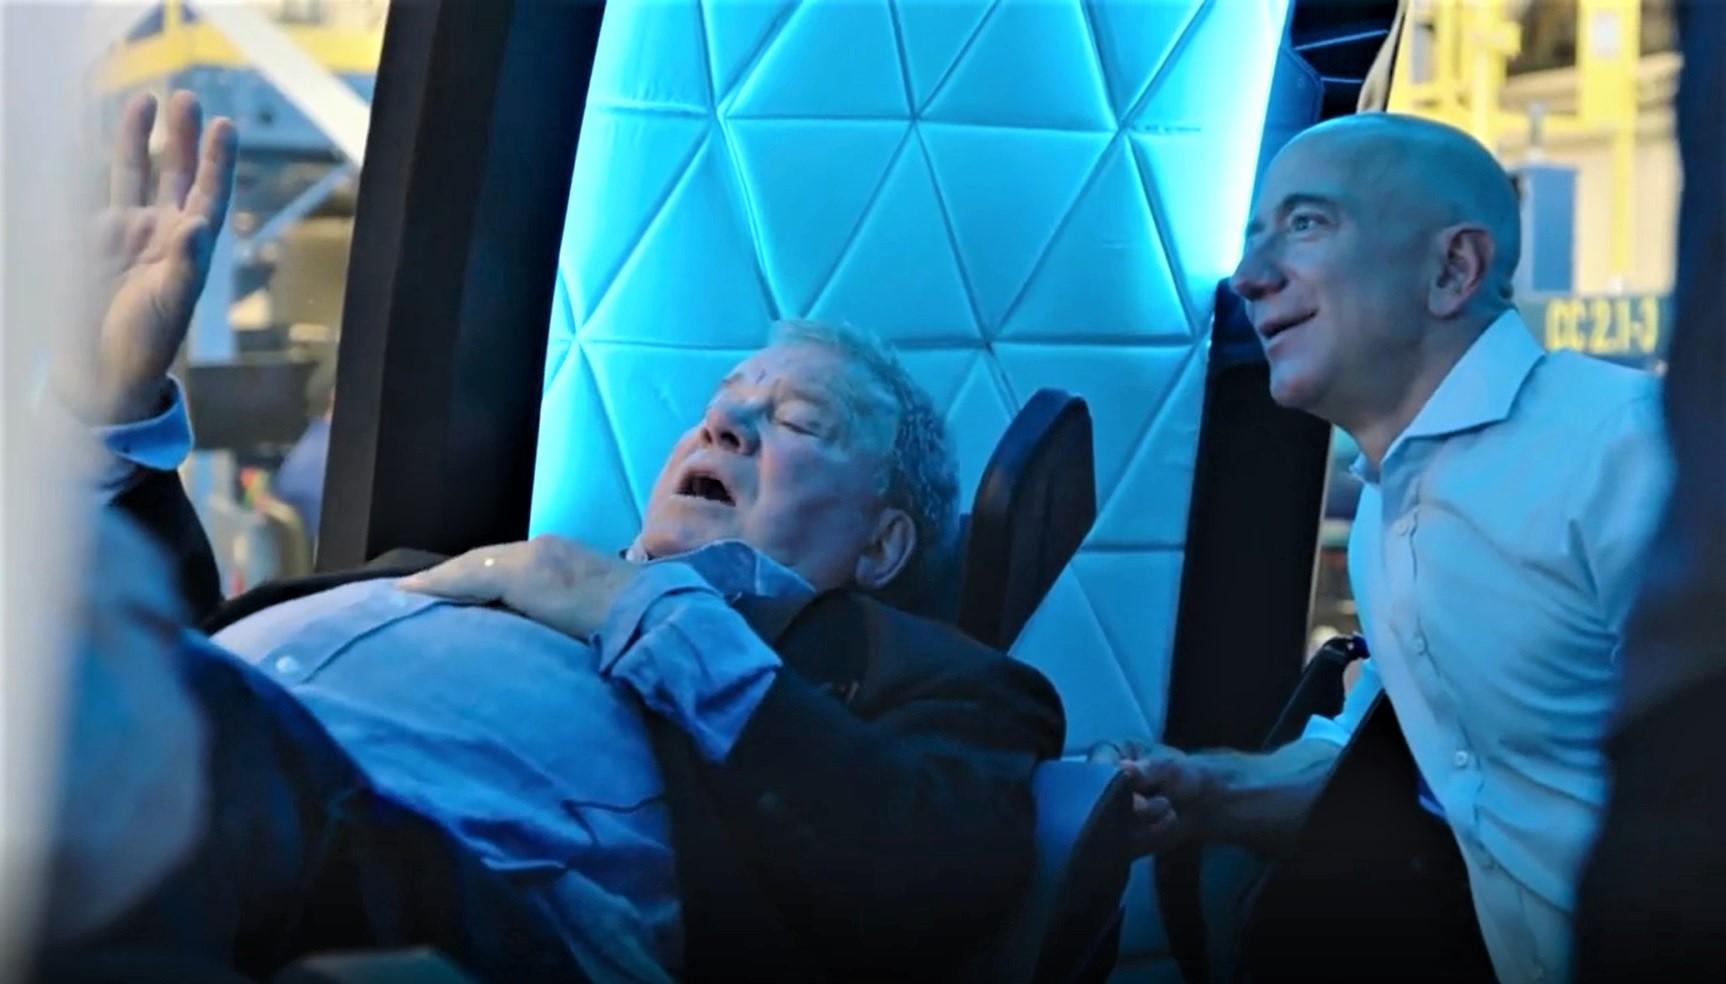 How to watch William Shatner beam up on Blue Origin's spaceship